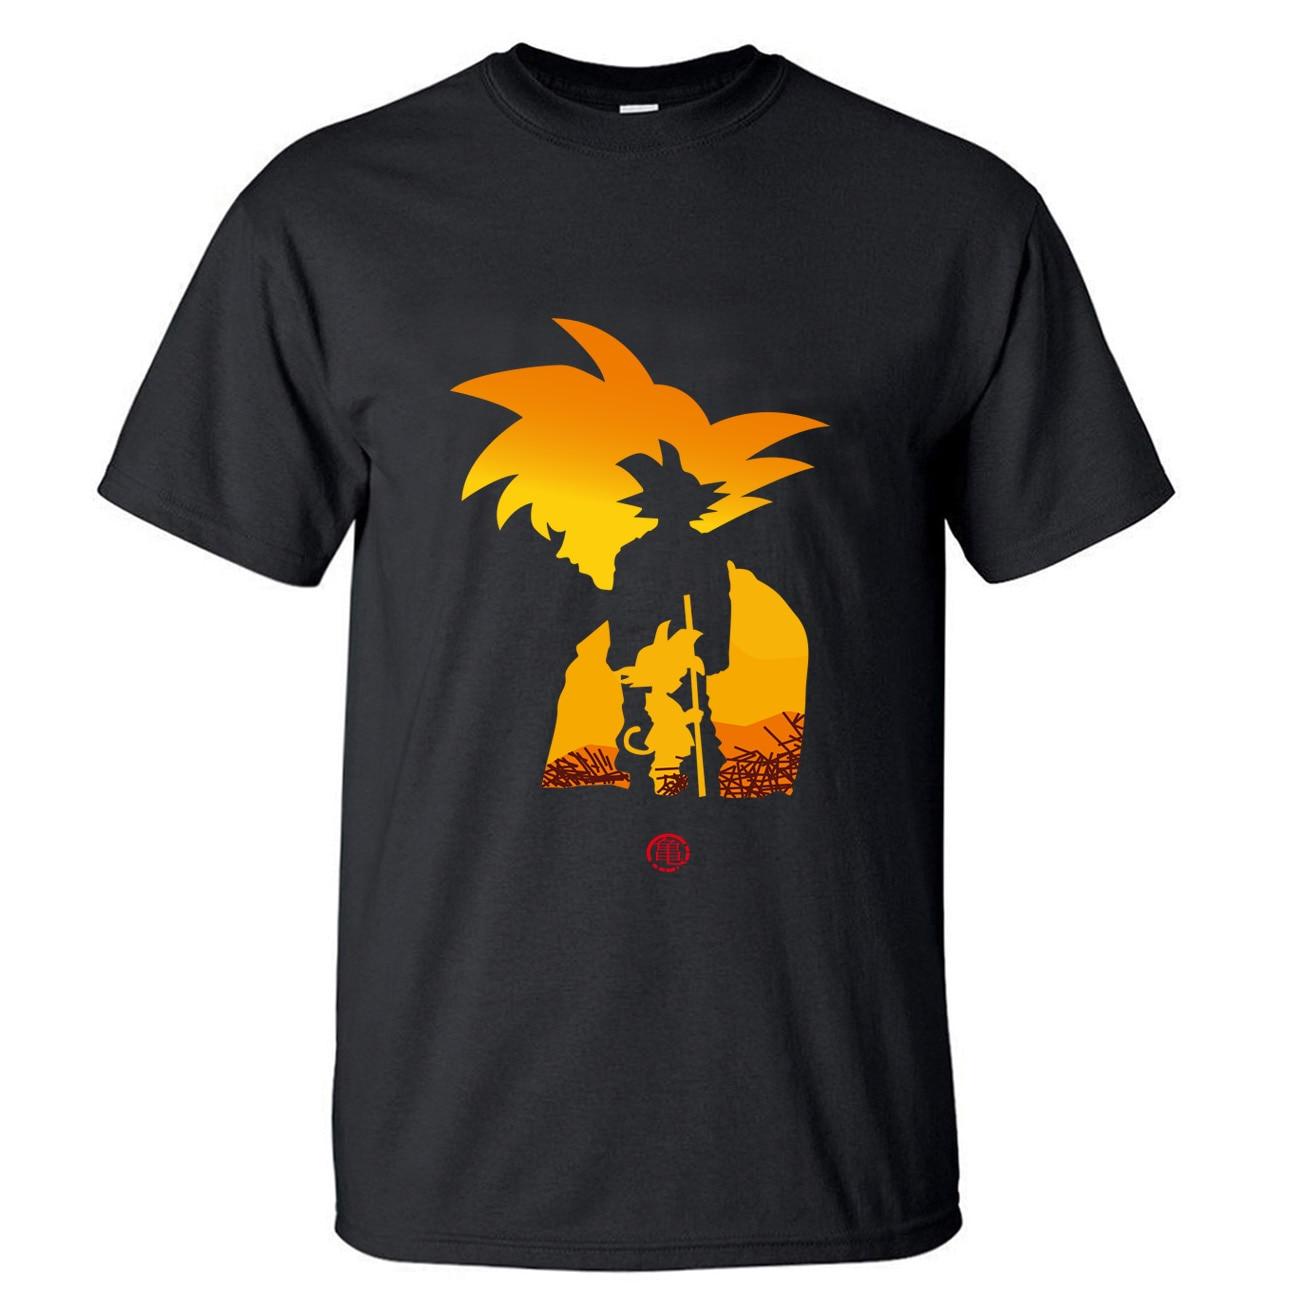 Camiseta Dragon Ball Z para hombre, camiseta Super Gohan, camisetas de verano, Tops de algodón de manga corta de Anime japonés, camiseta de Dragonball Harajuku